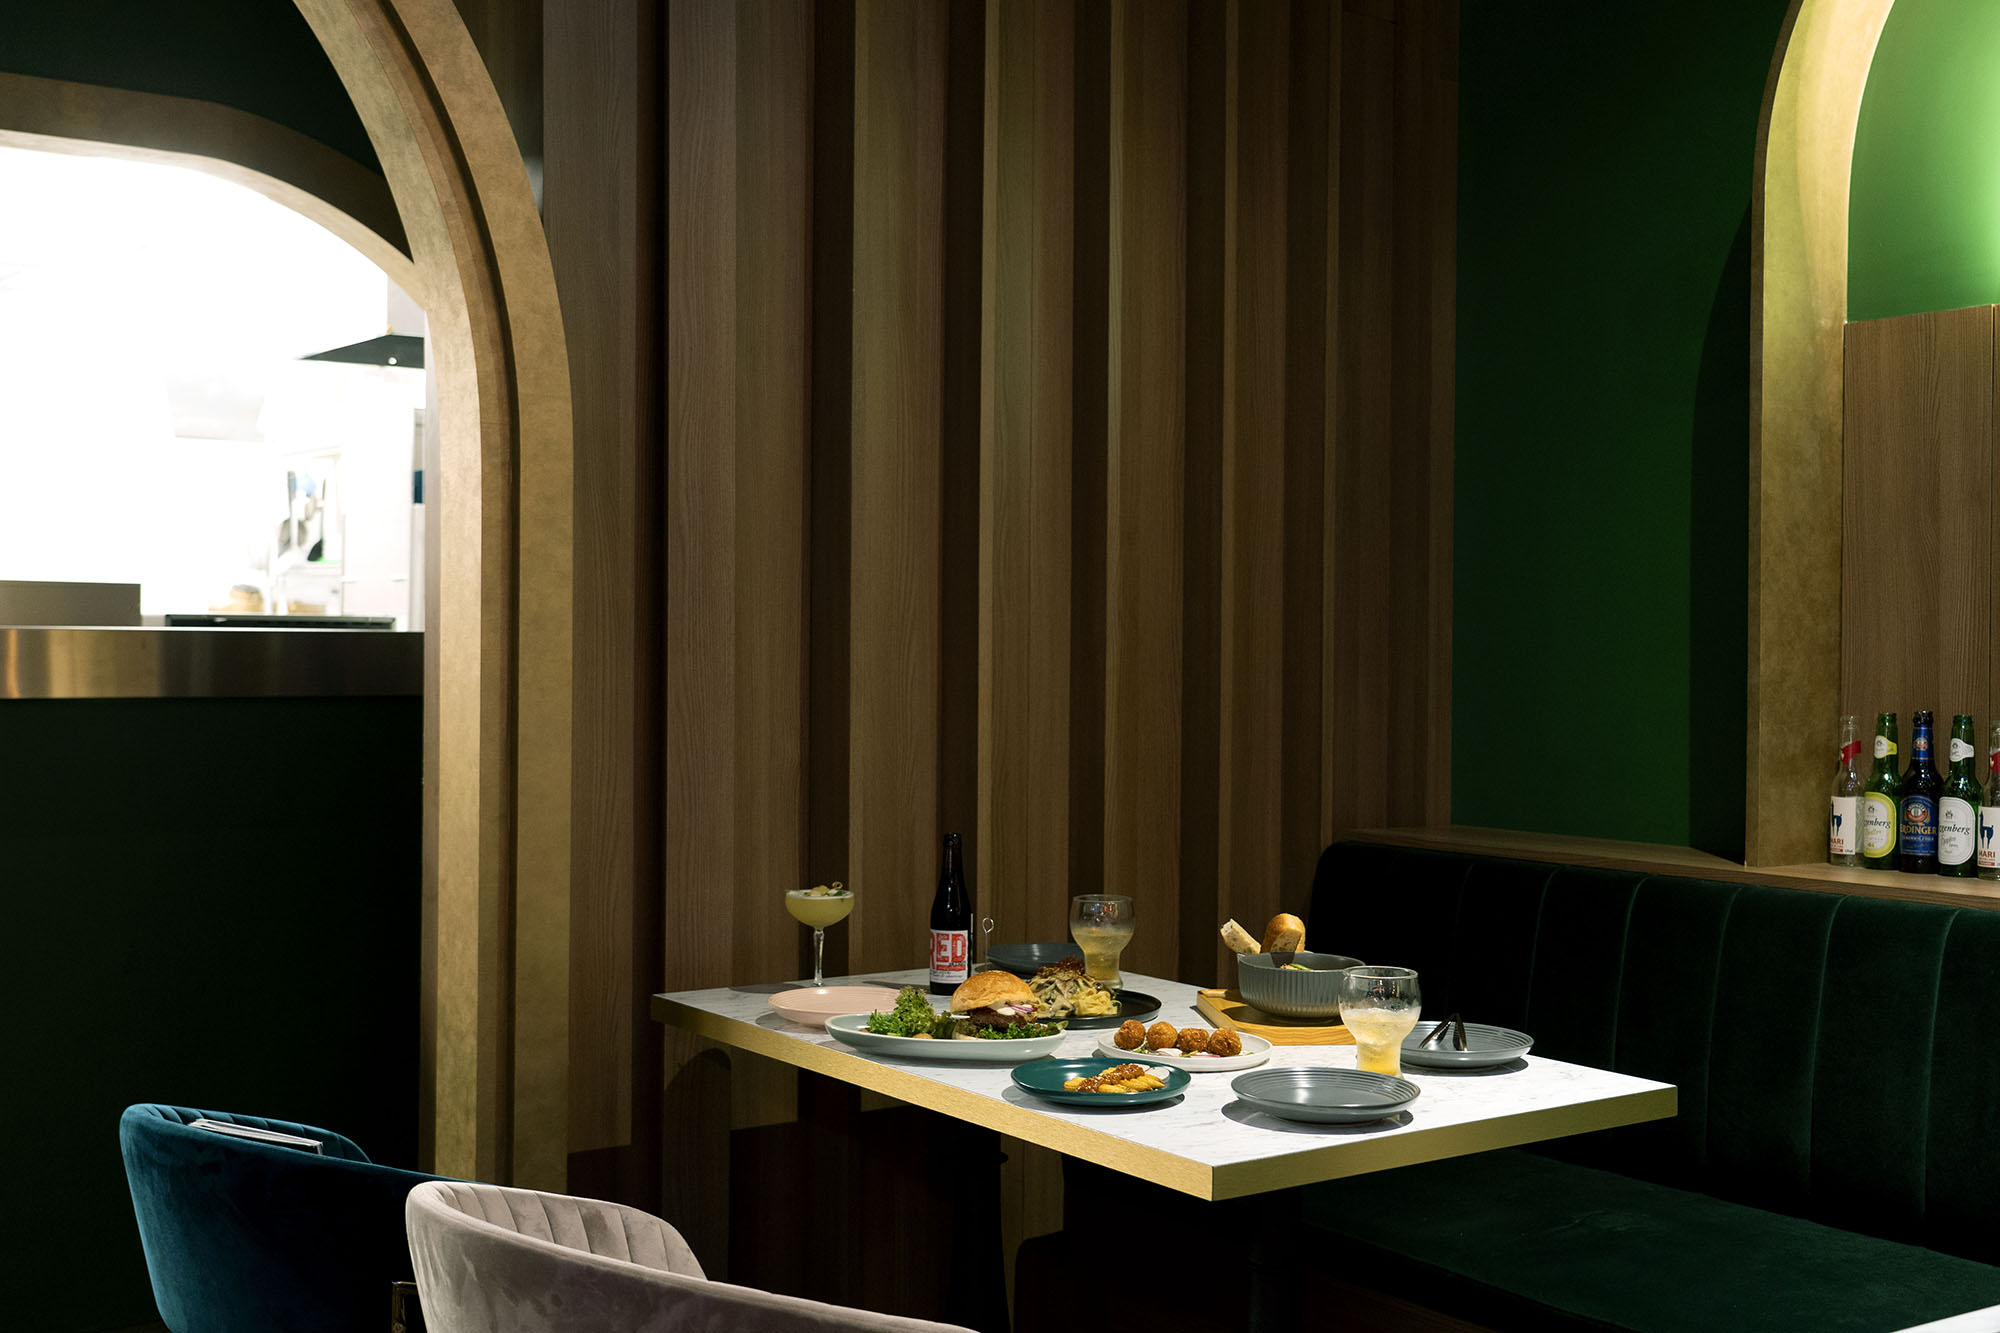 Vegan Amore 蔬慕|台北蔬食西式餐酒館,春季裡的兒時大人味 @MENS 30S LIFE